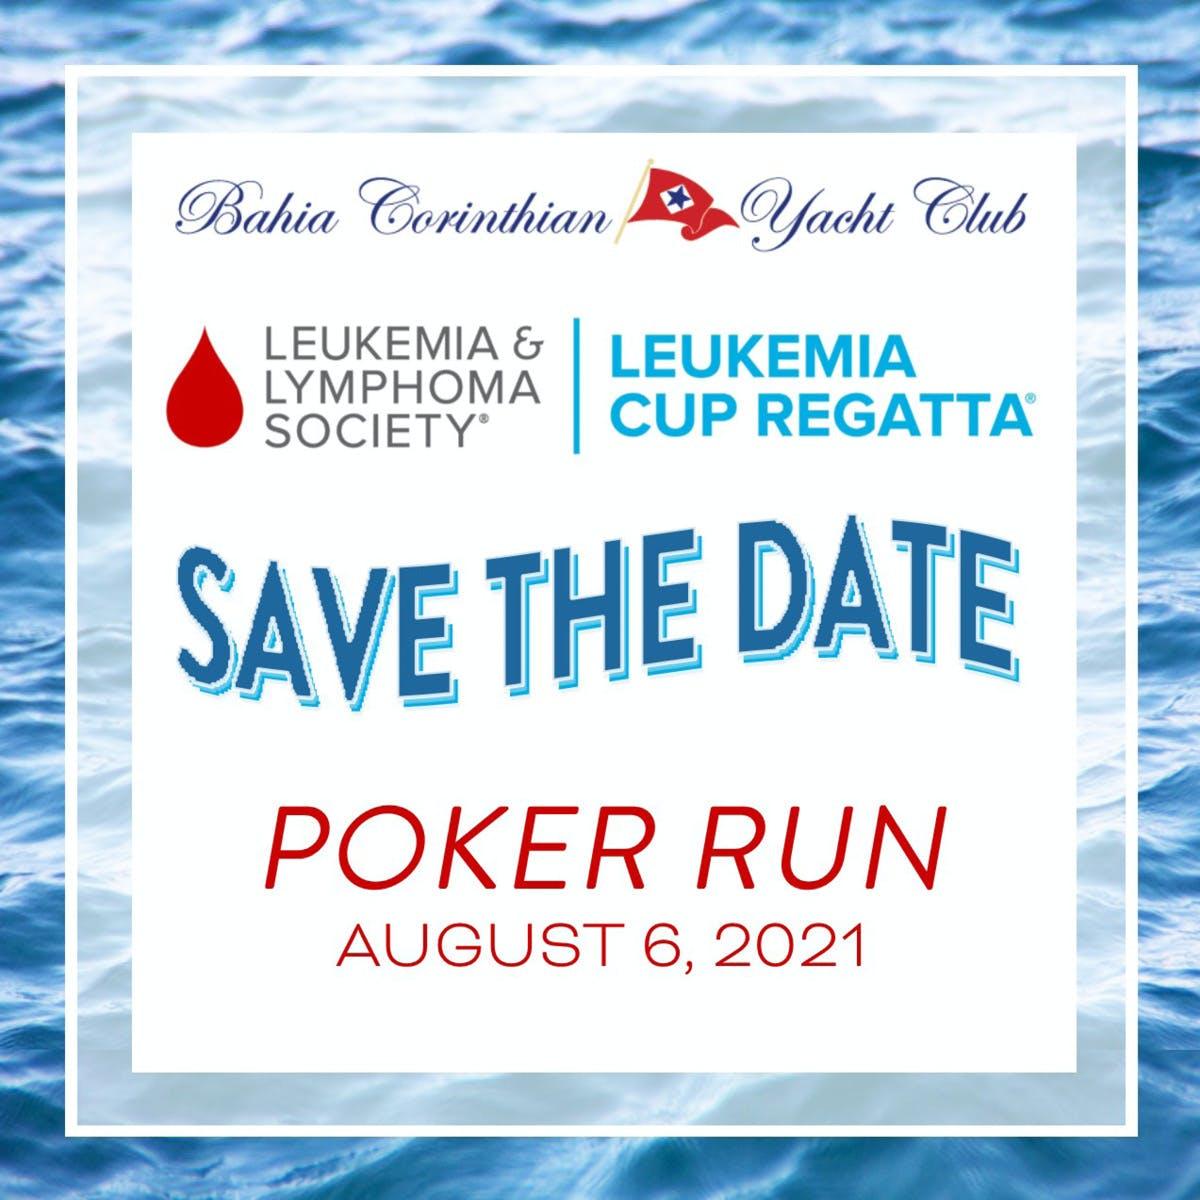 Poker Run